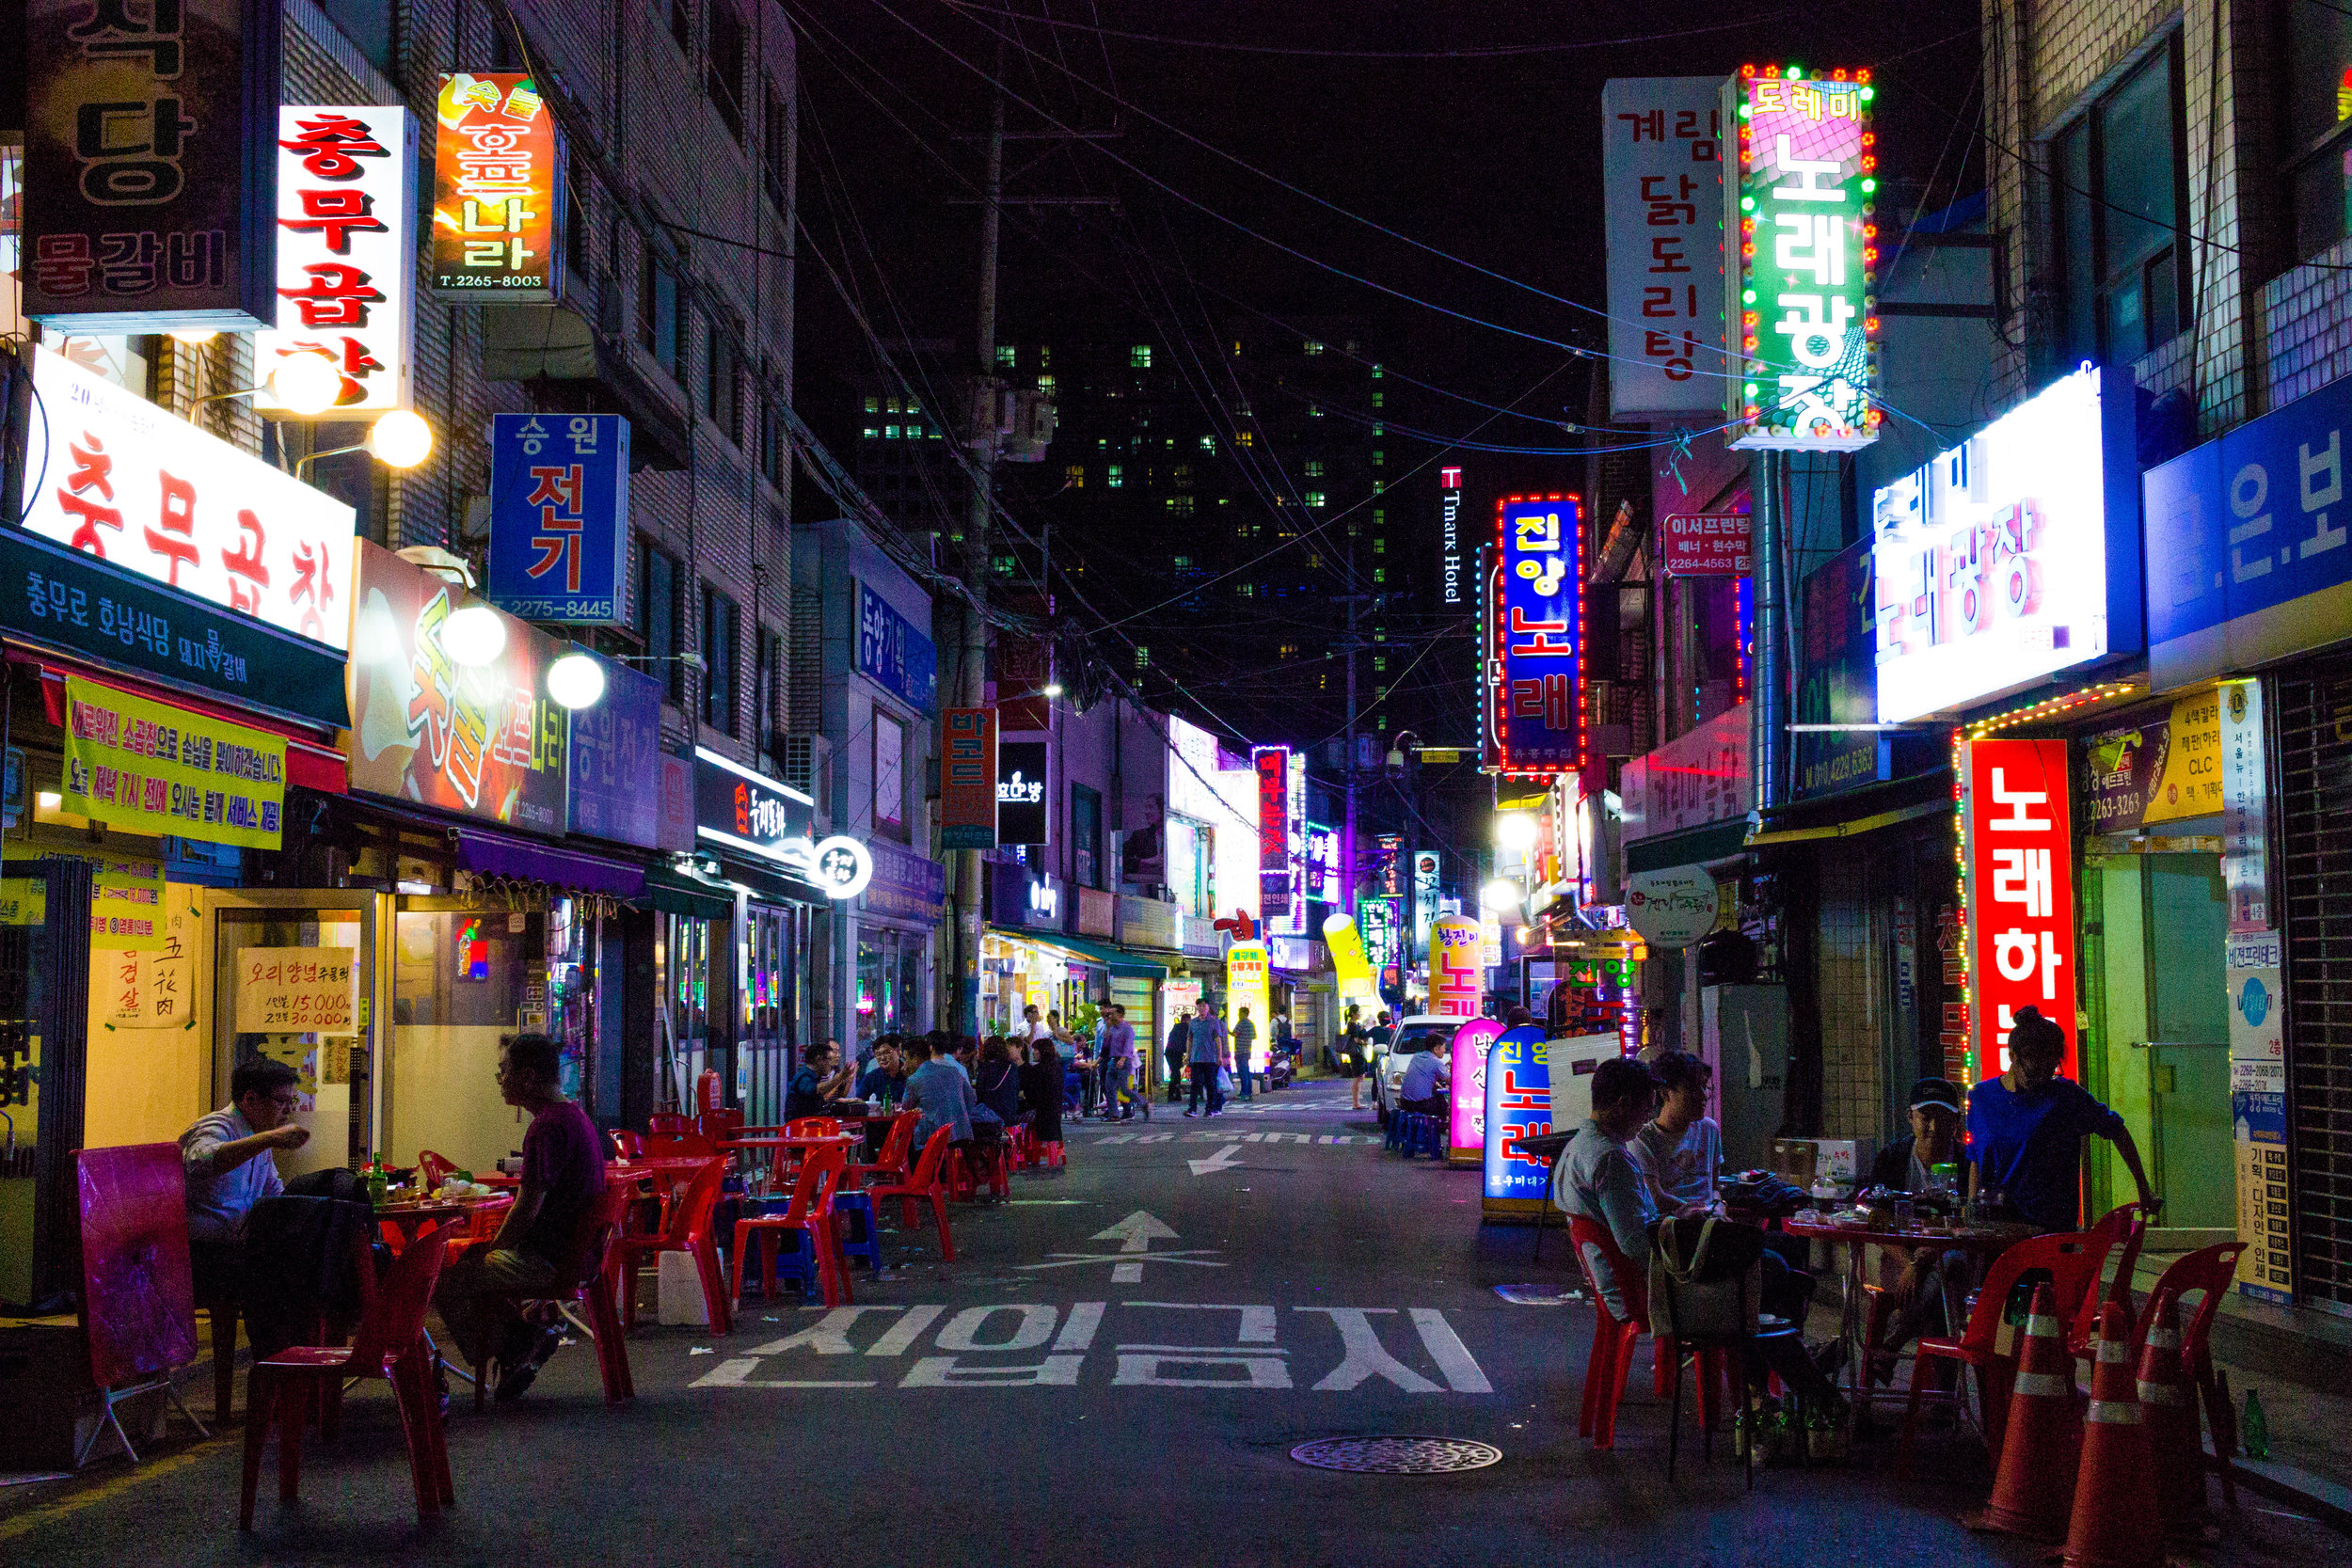 A street in Jongno-Gu lit up on a Monday evening